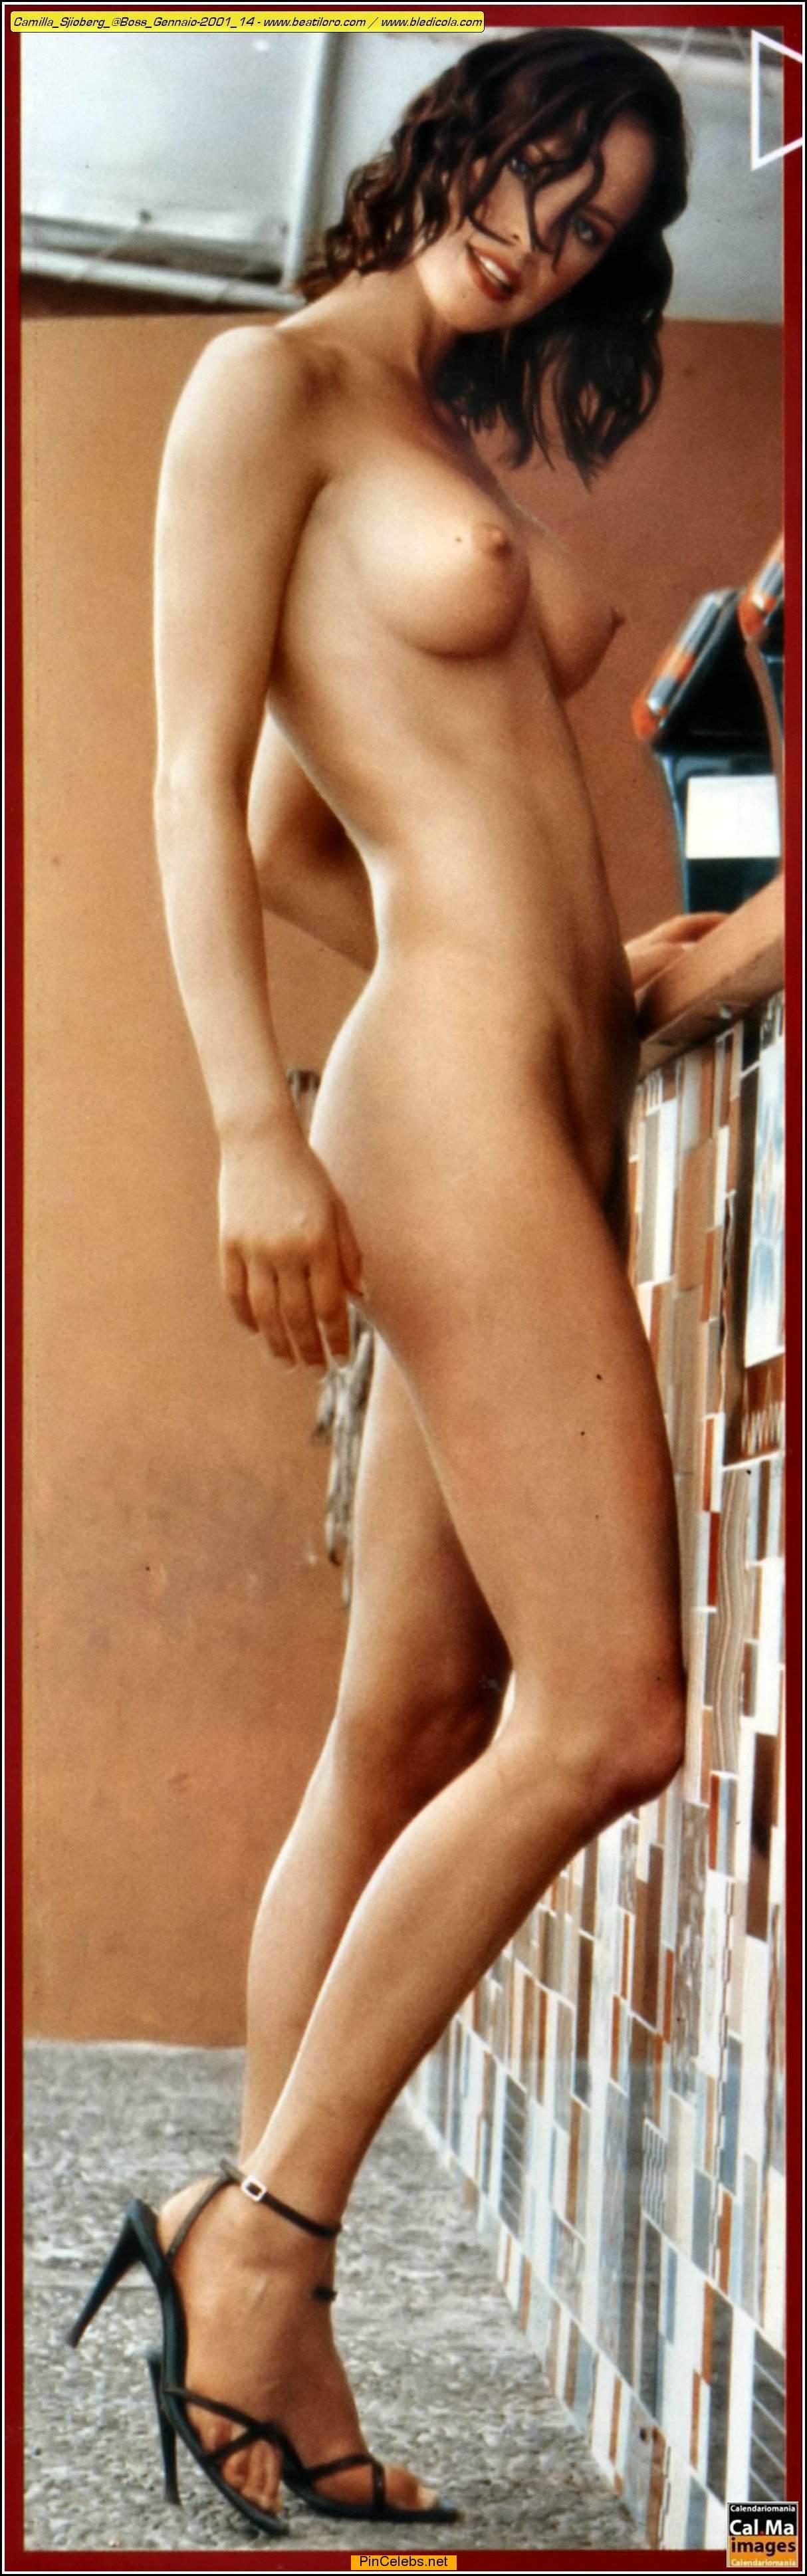 Camilla Sjioberg fully nude